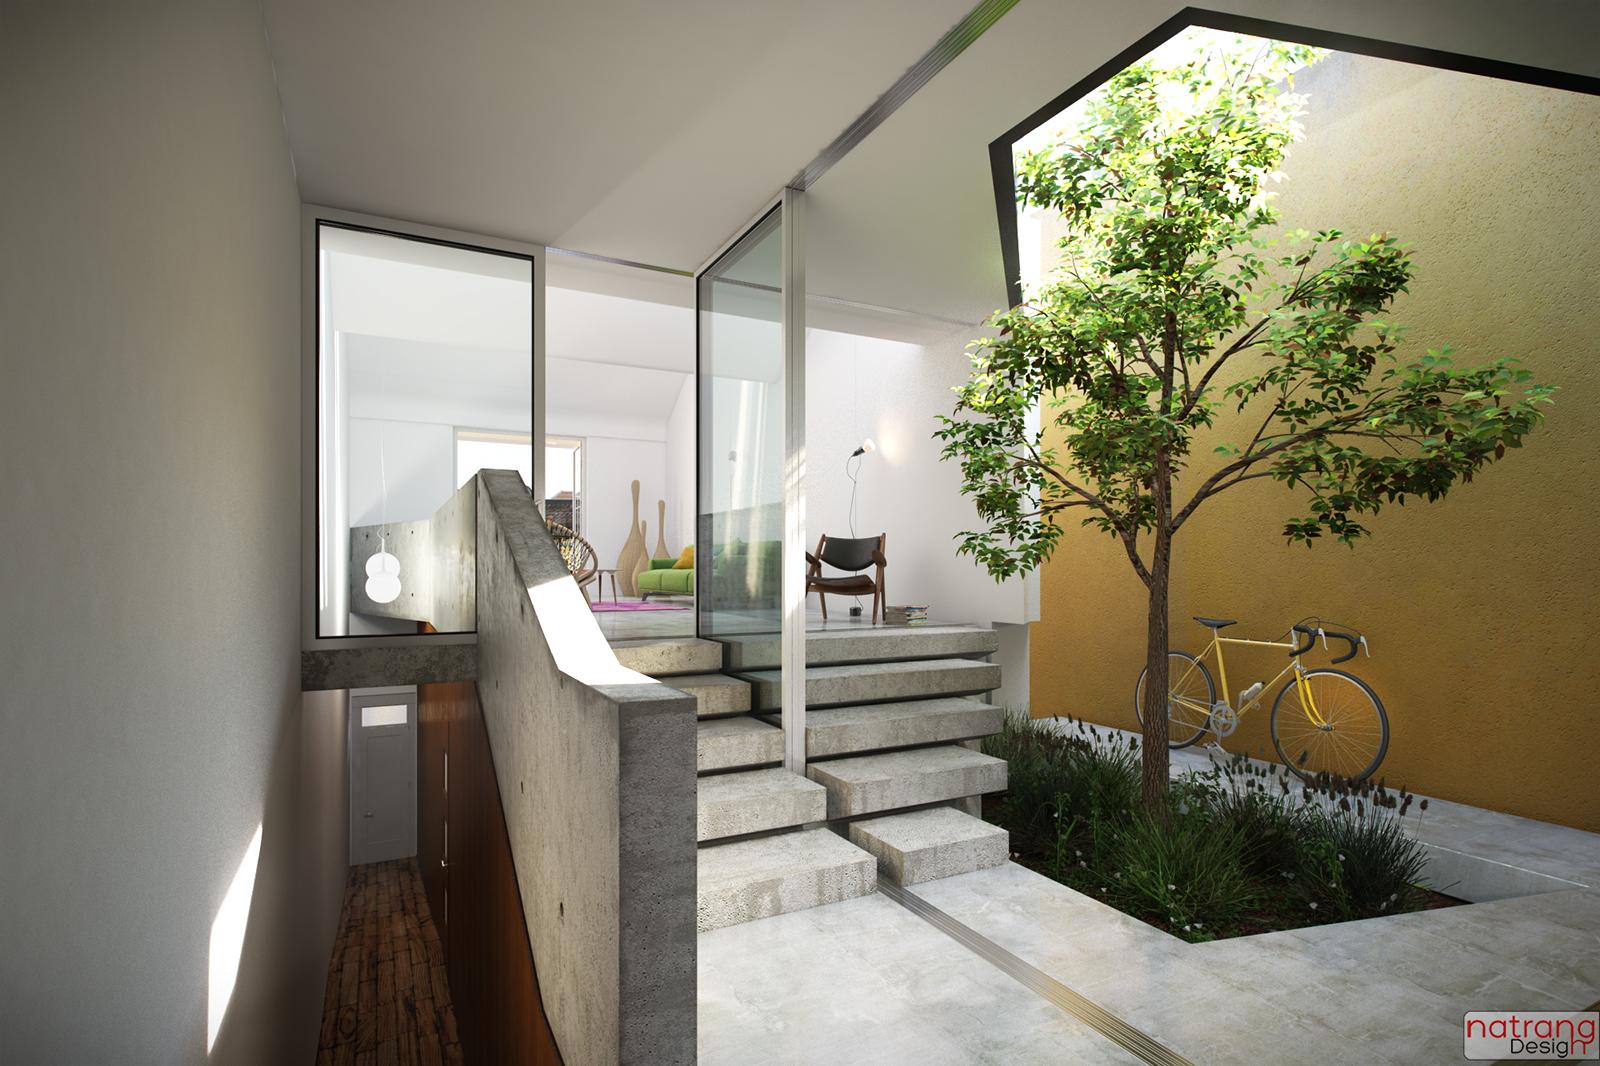 Skylight House Natrangdesign